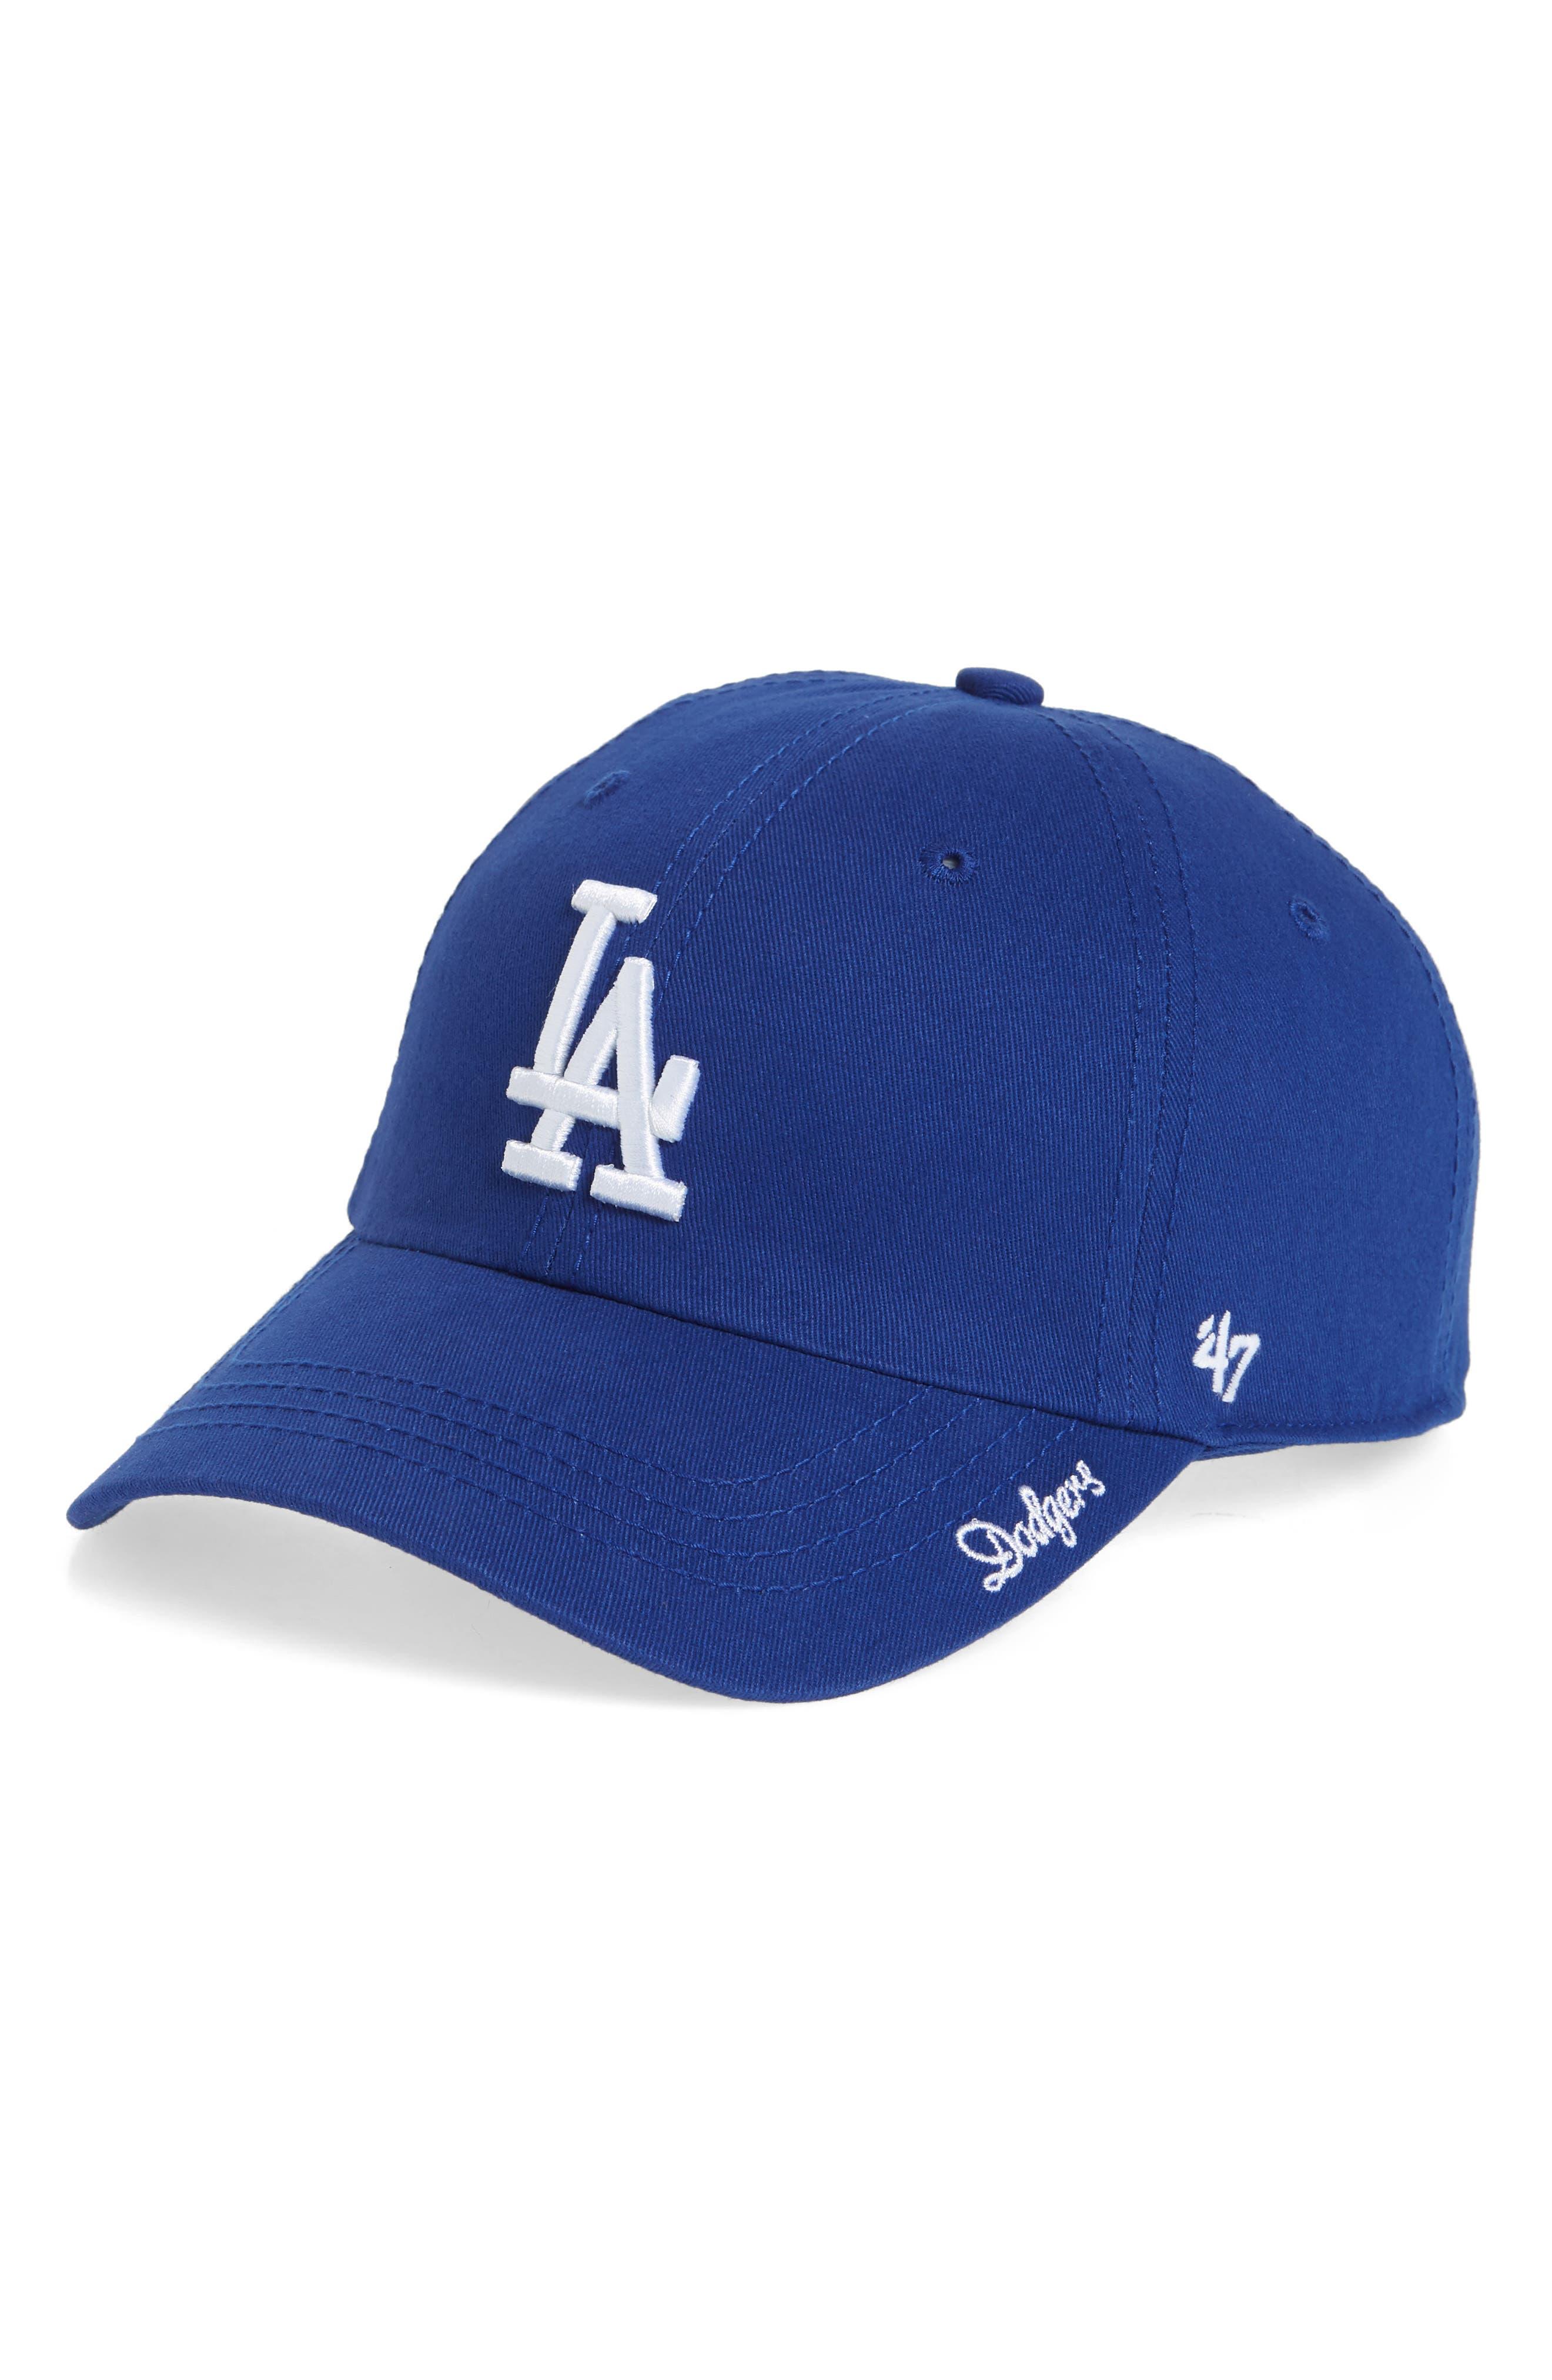 Miata Clean-Up Los Angeles Dodgers Baseball Cap,                         Main,                         color, Royal